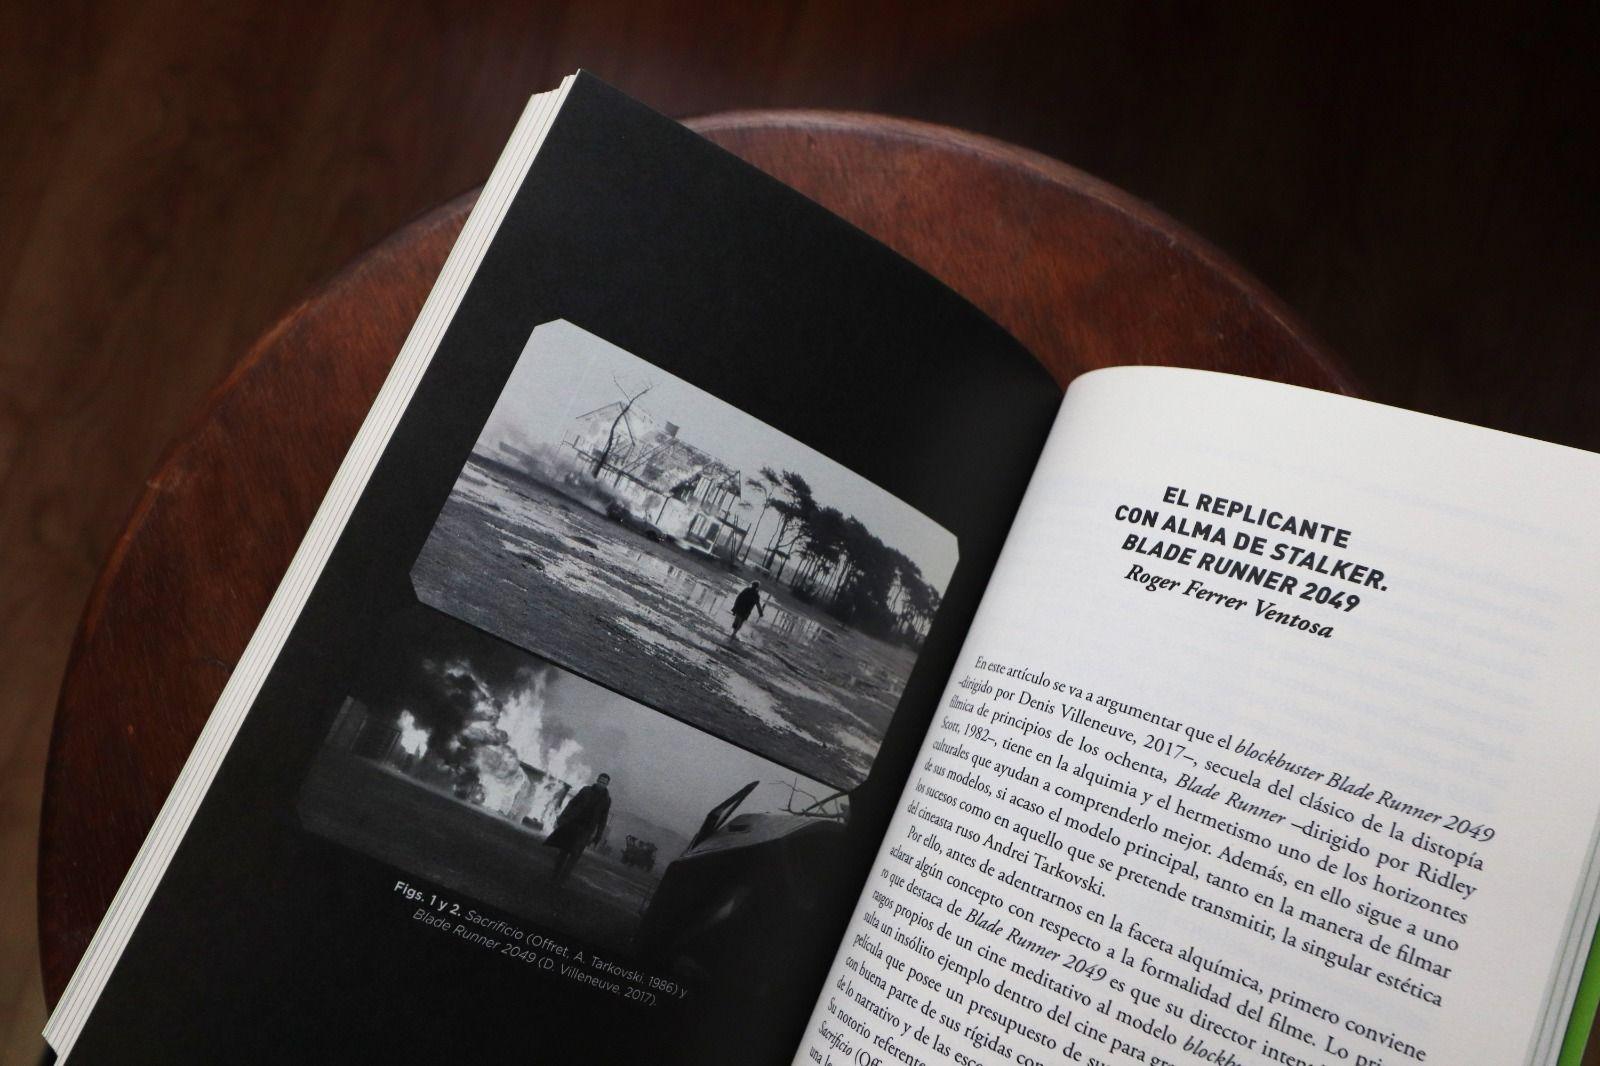 Imaginar Mundos – Sans Soleil Ediciones 2019-05-14 at 19.45.44 (18)